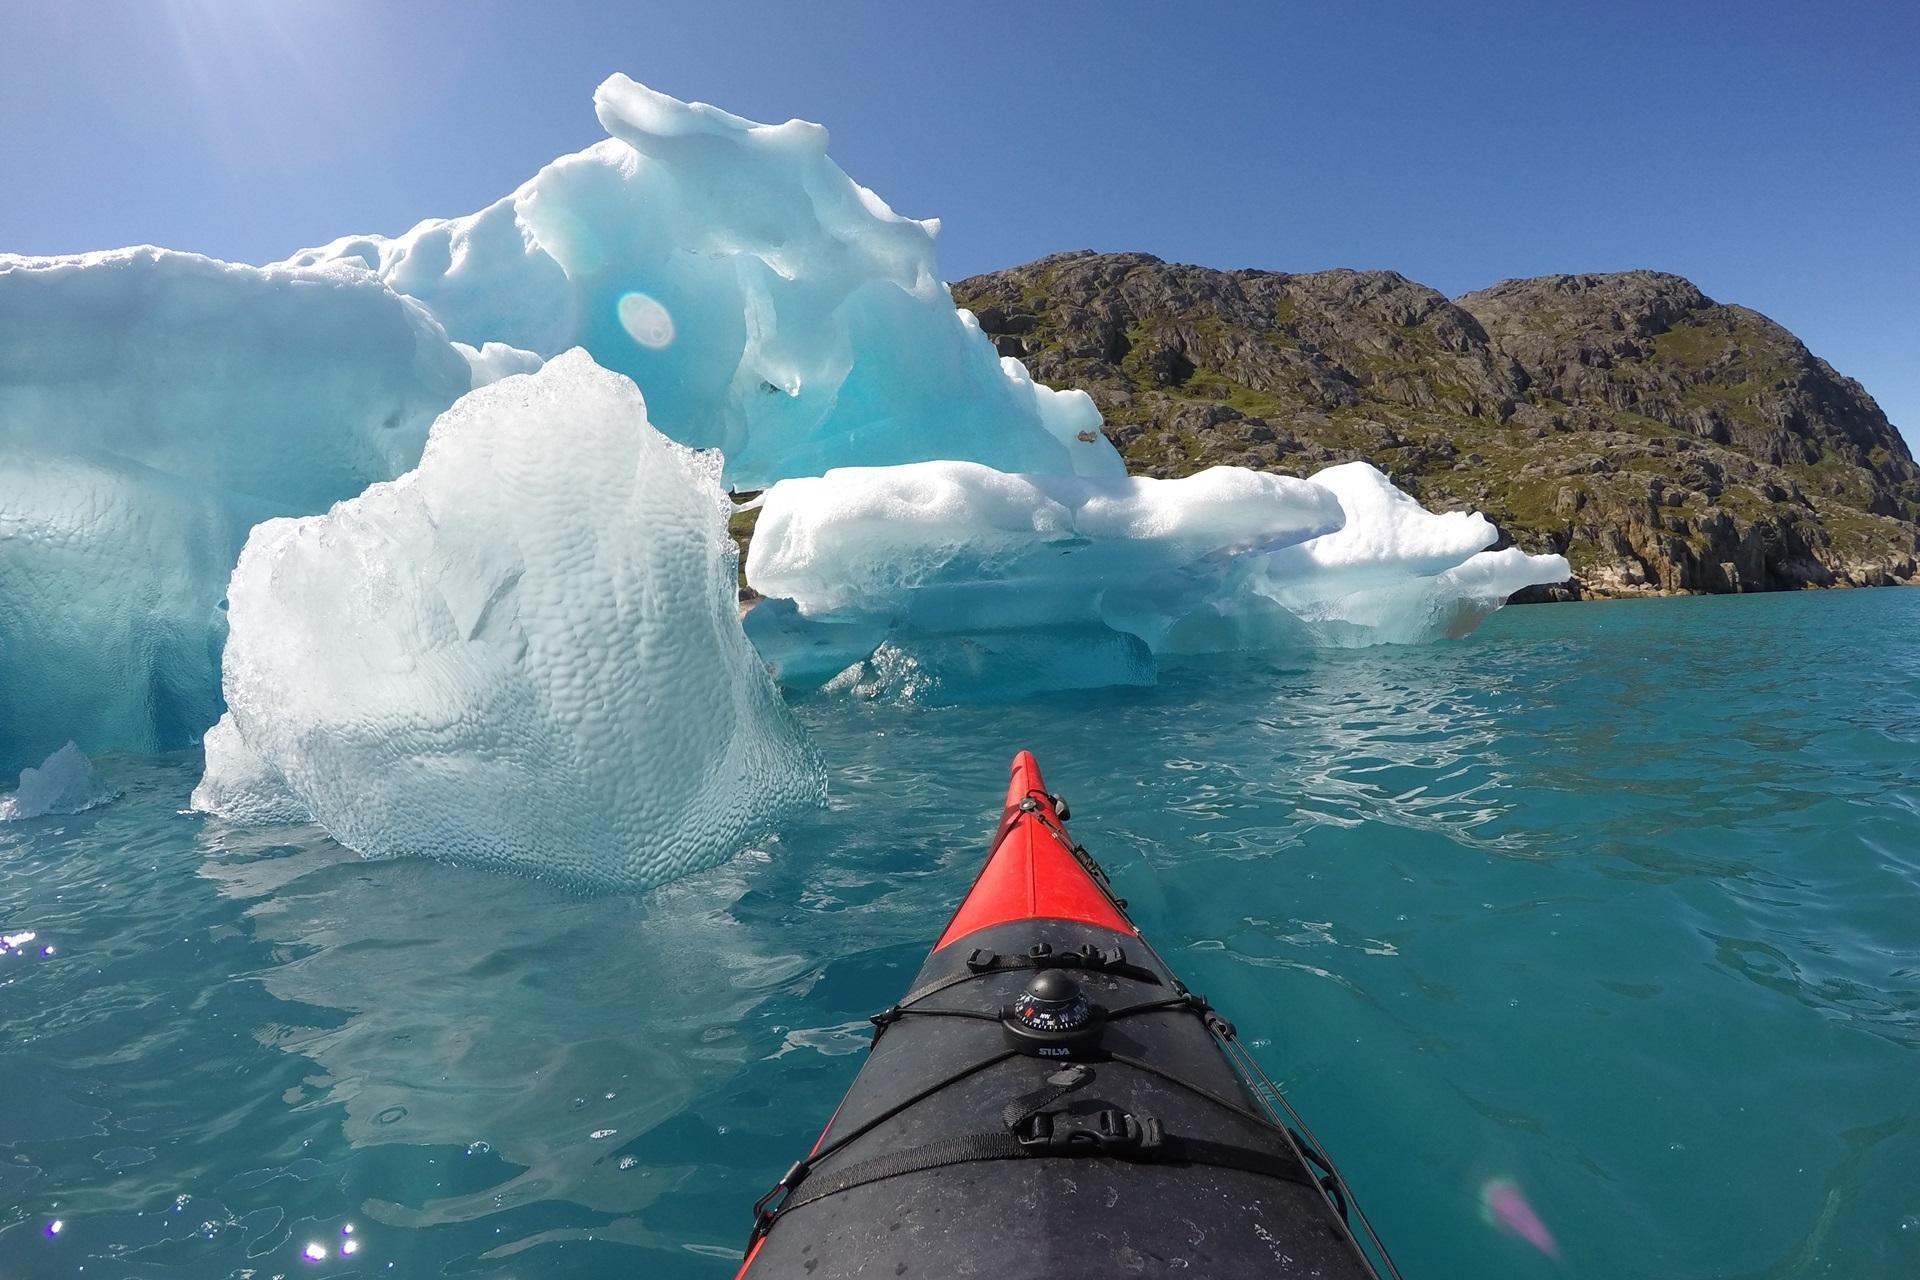 Kayak at Ice. By Visit Greenland